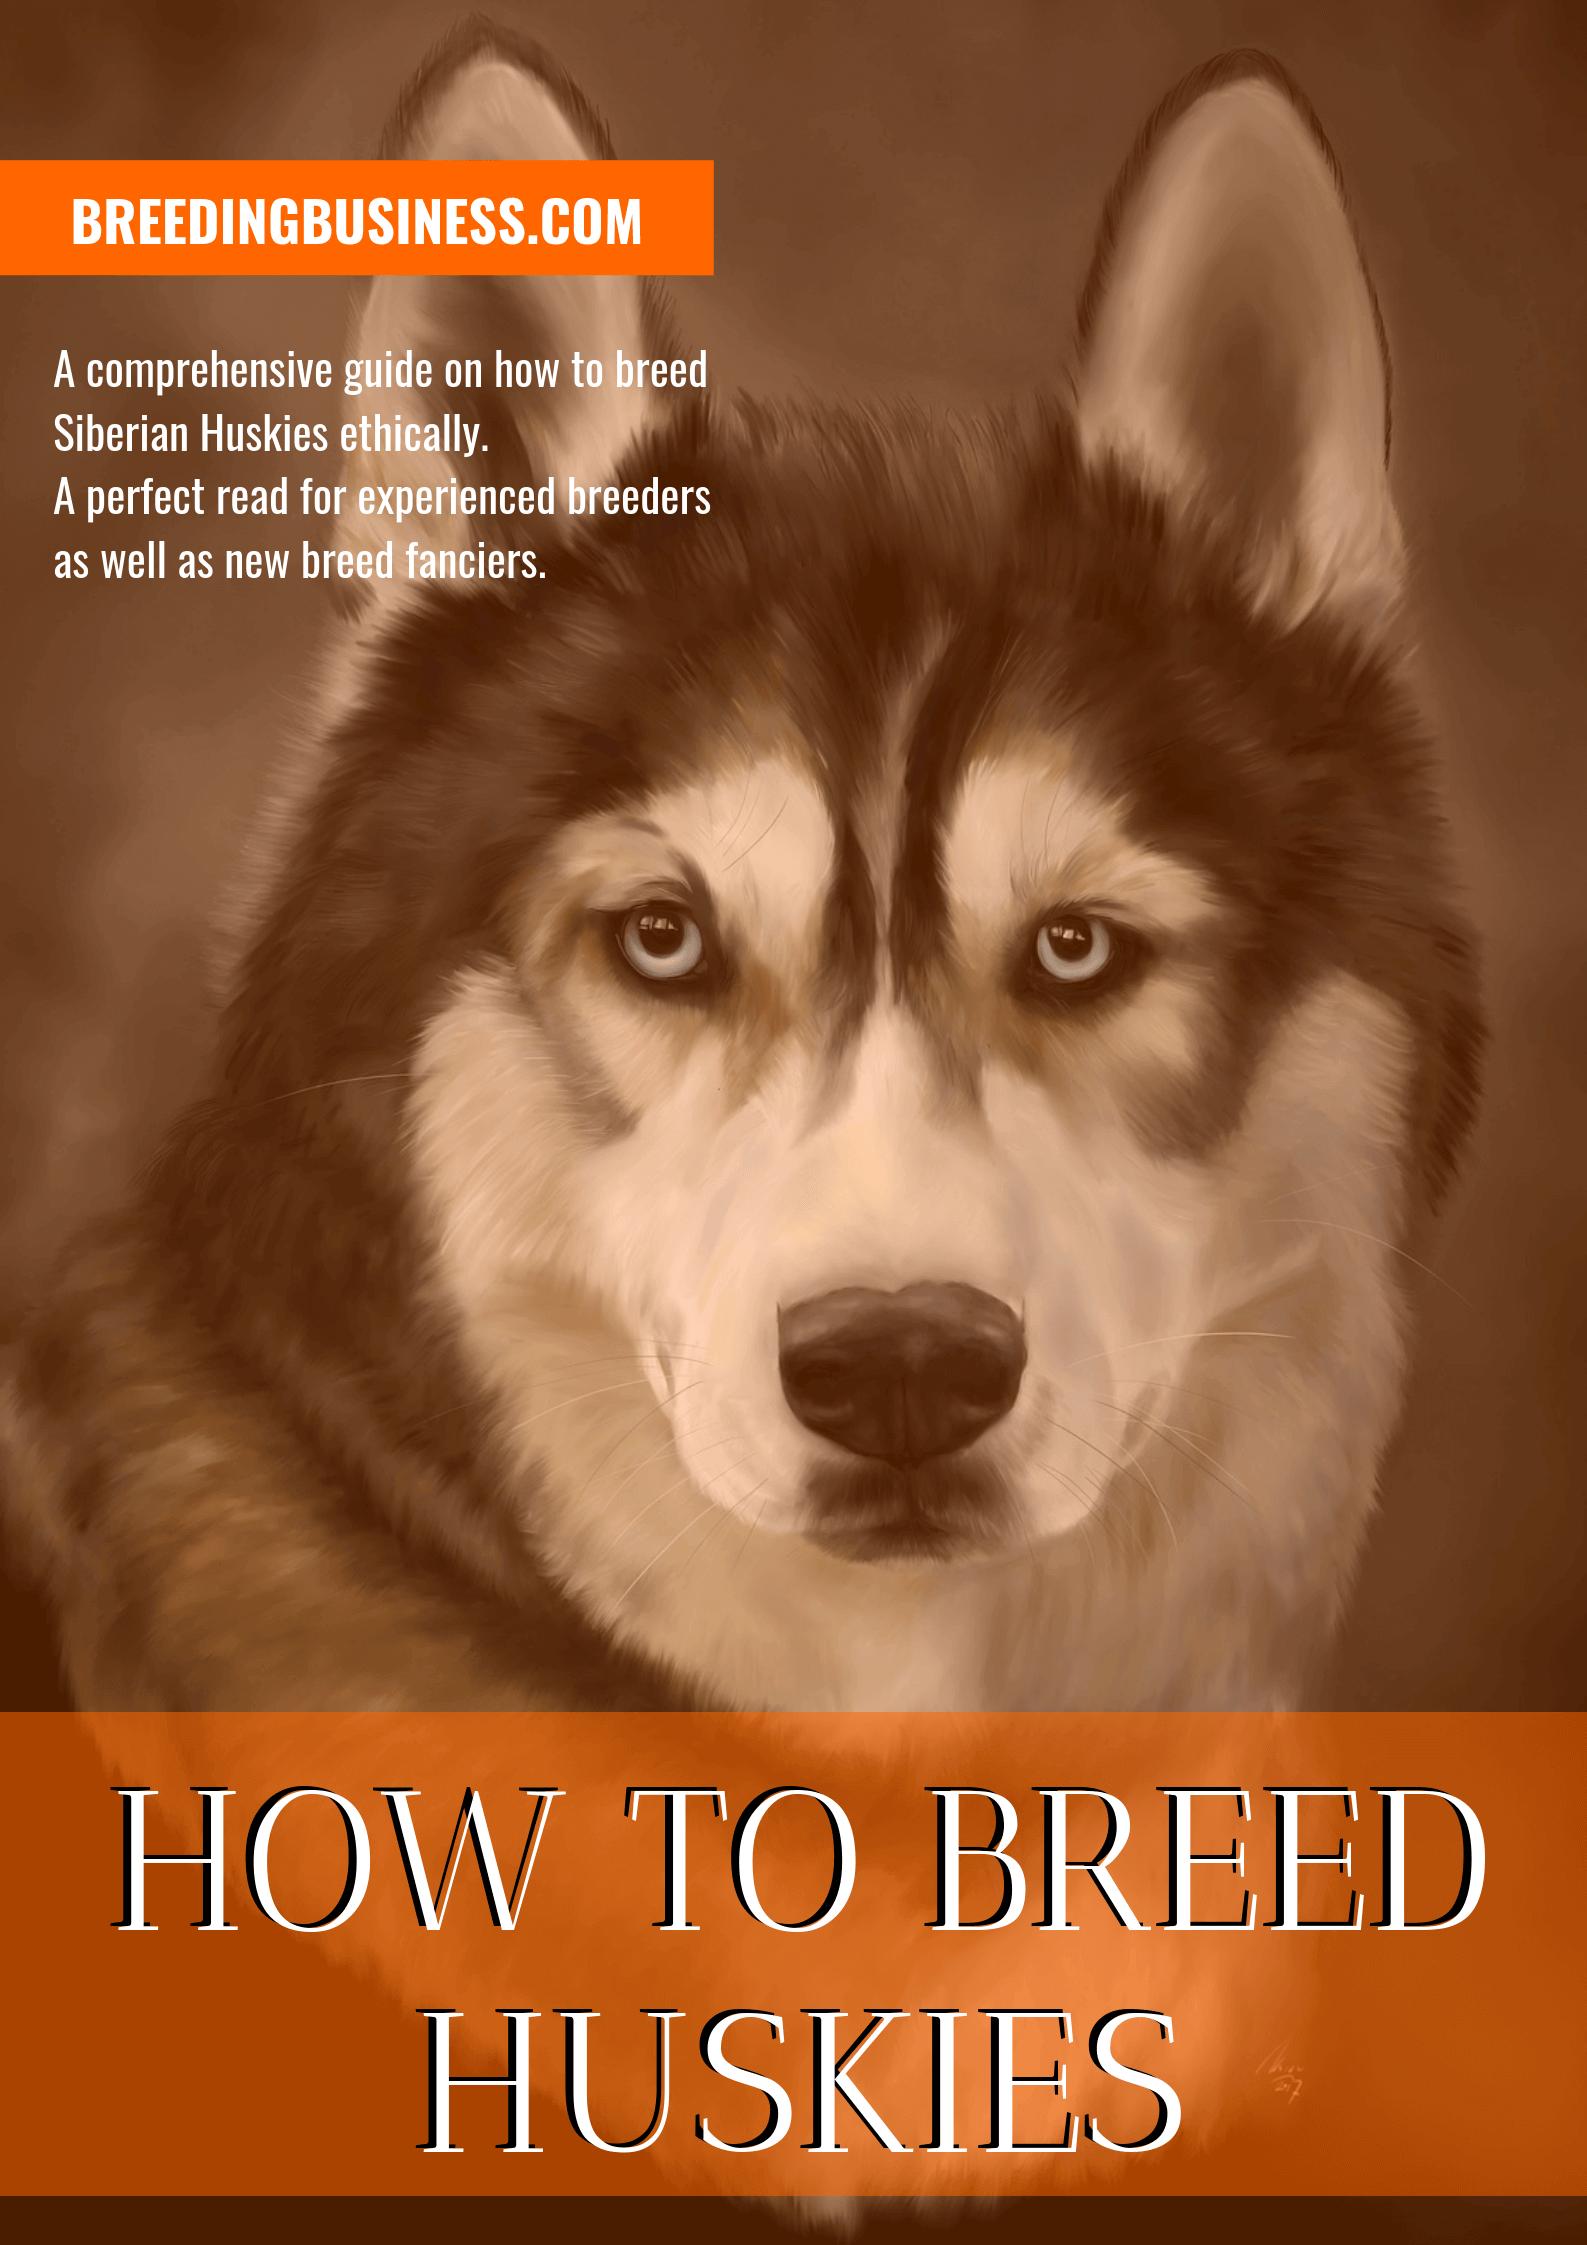 breeding Huskies